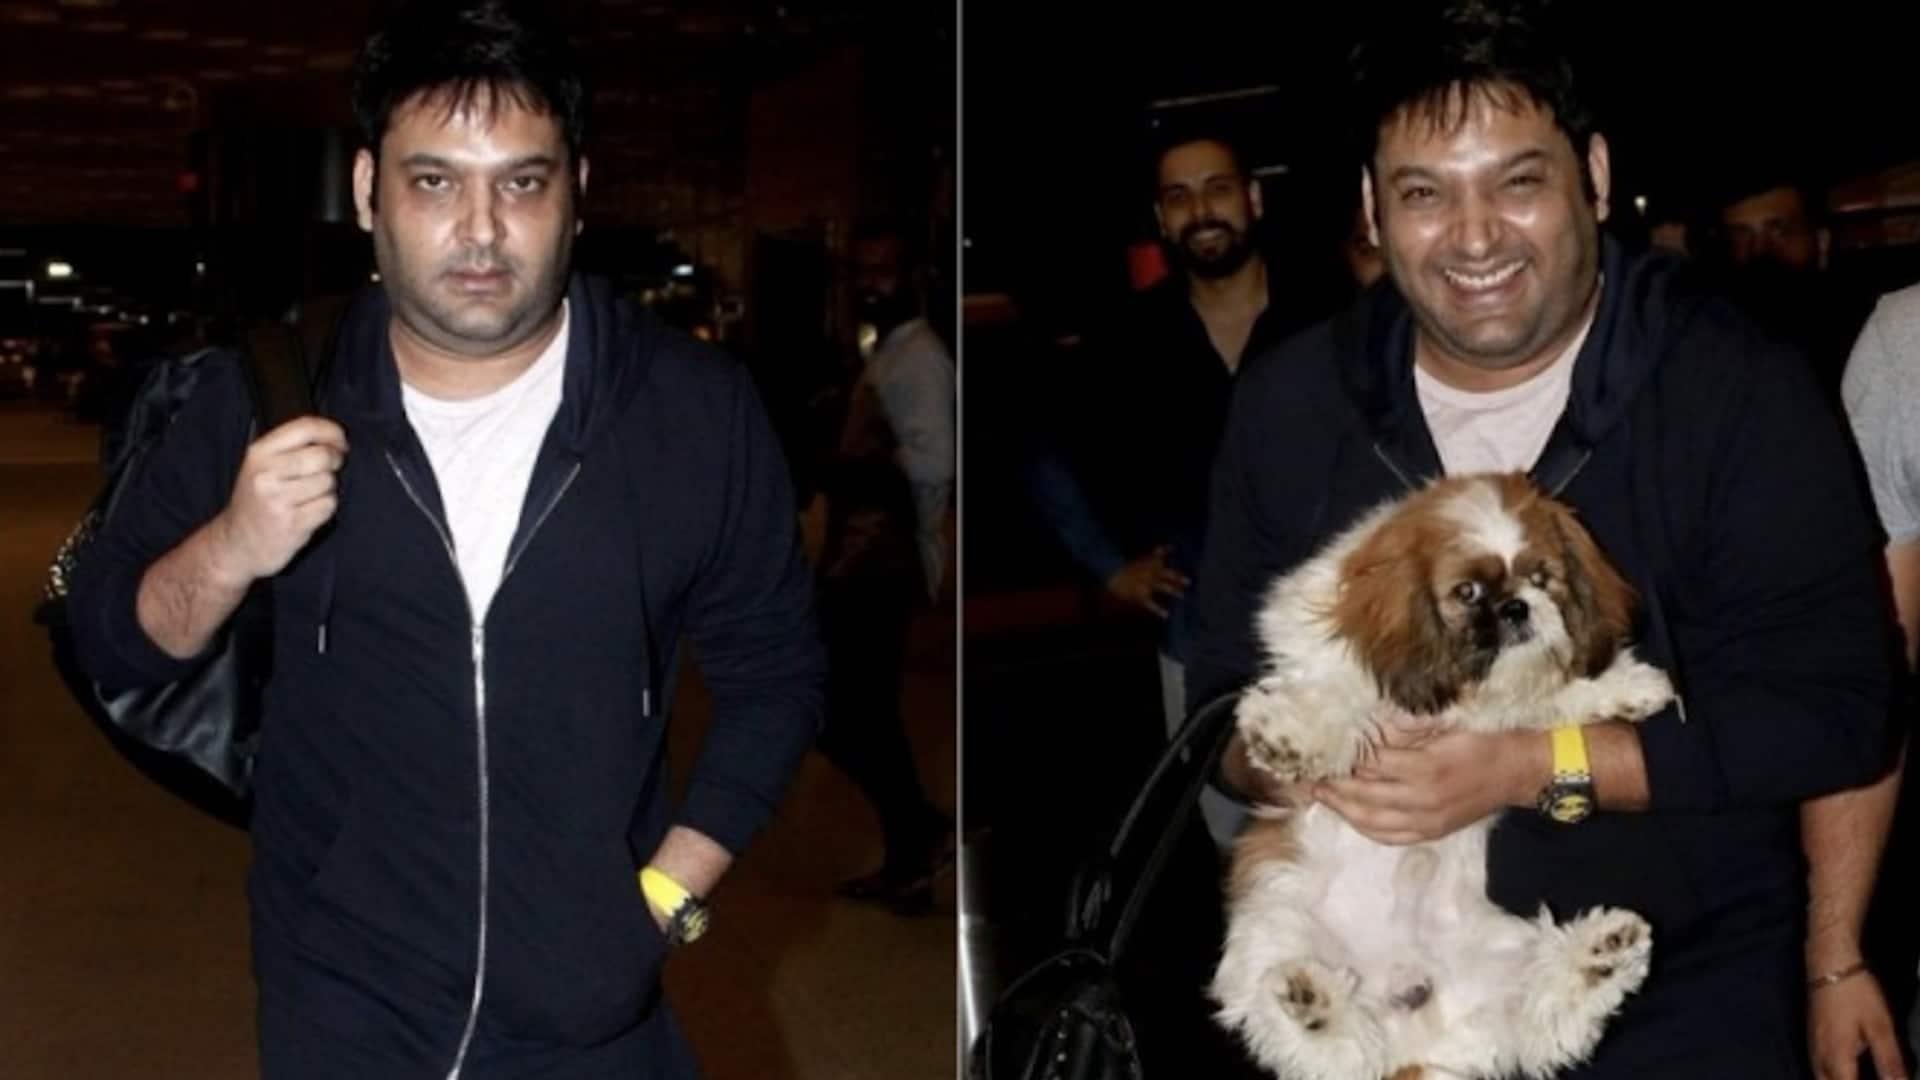 Kapil Sharma recovering all set to make a comeback with The Kapil Sharma Show